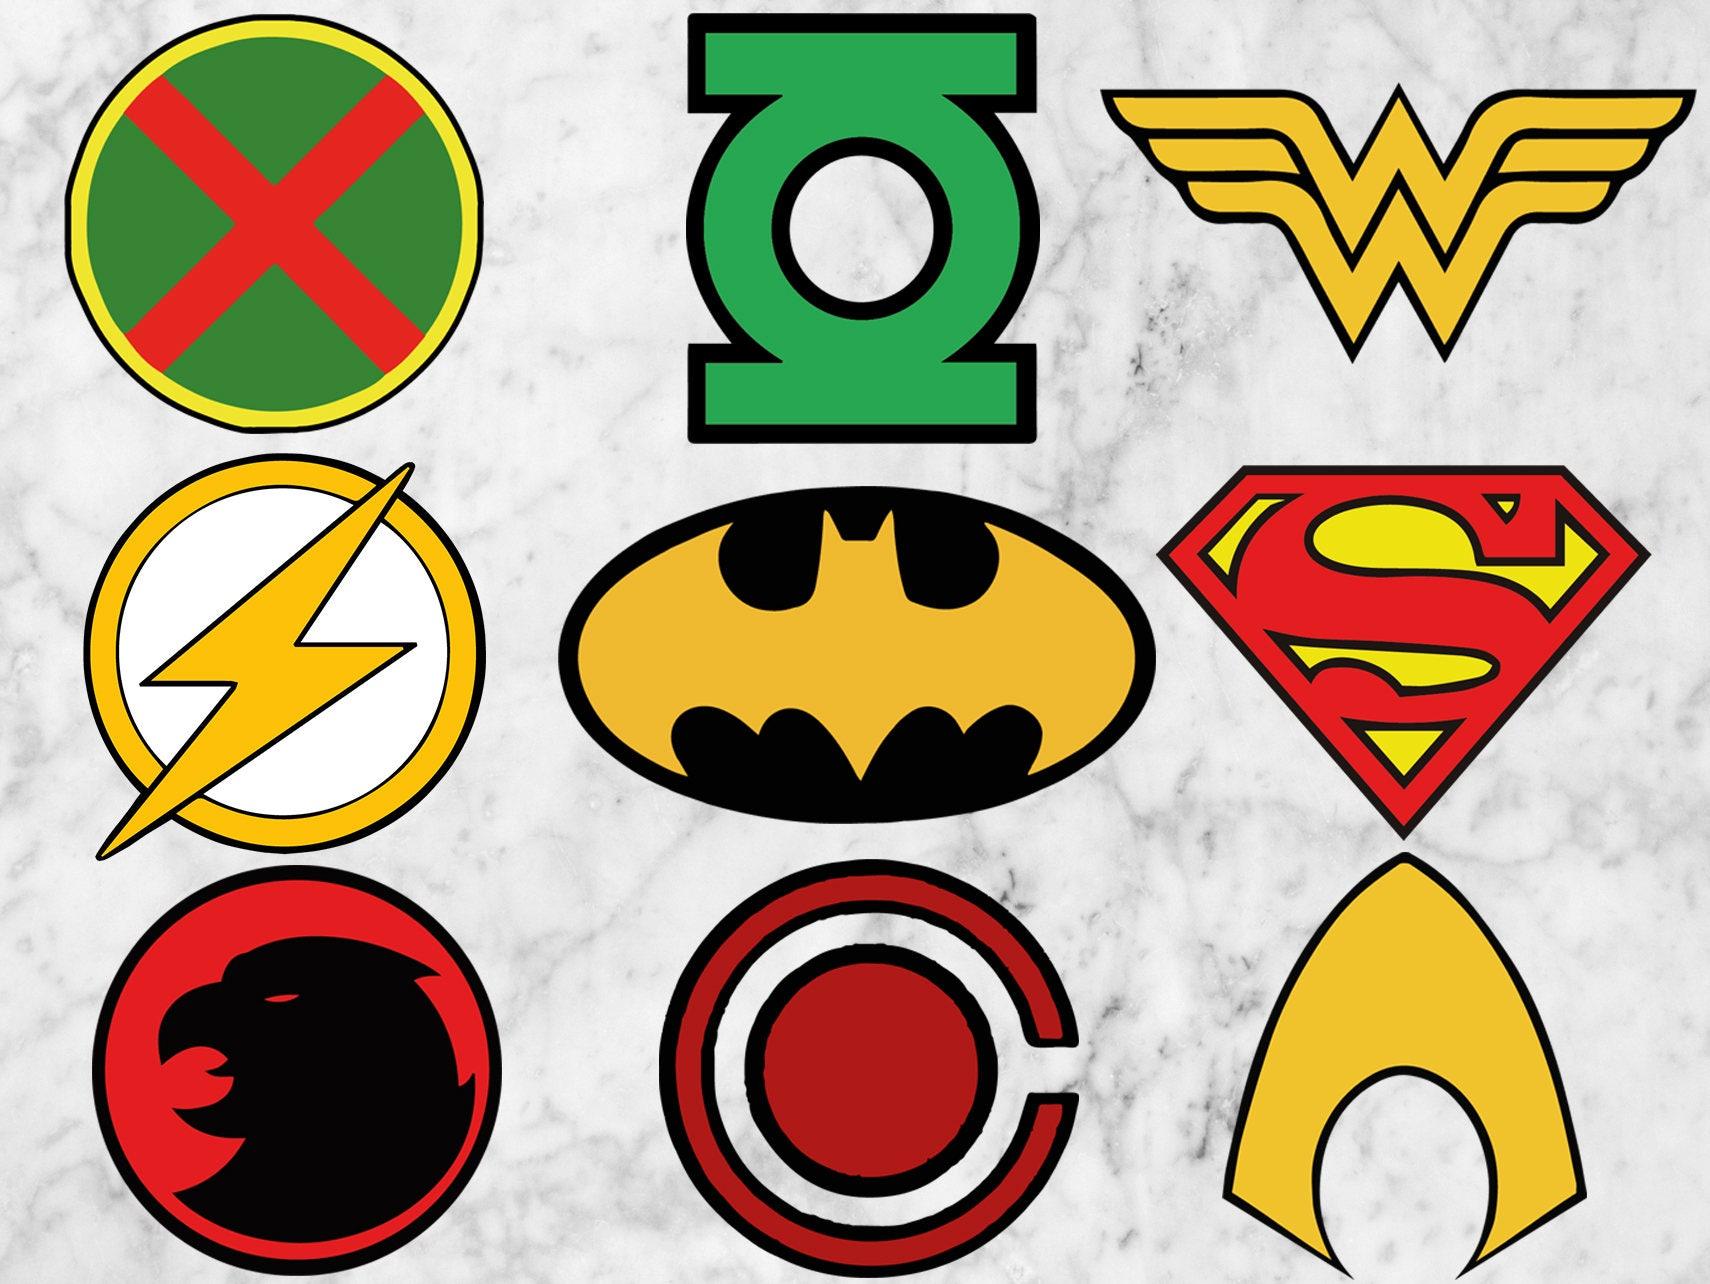 Justice league heros logos SVG Heros clipart Hero logo Svg Justice League Emblem Images